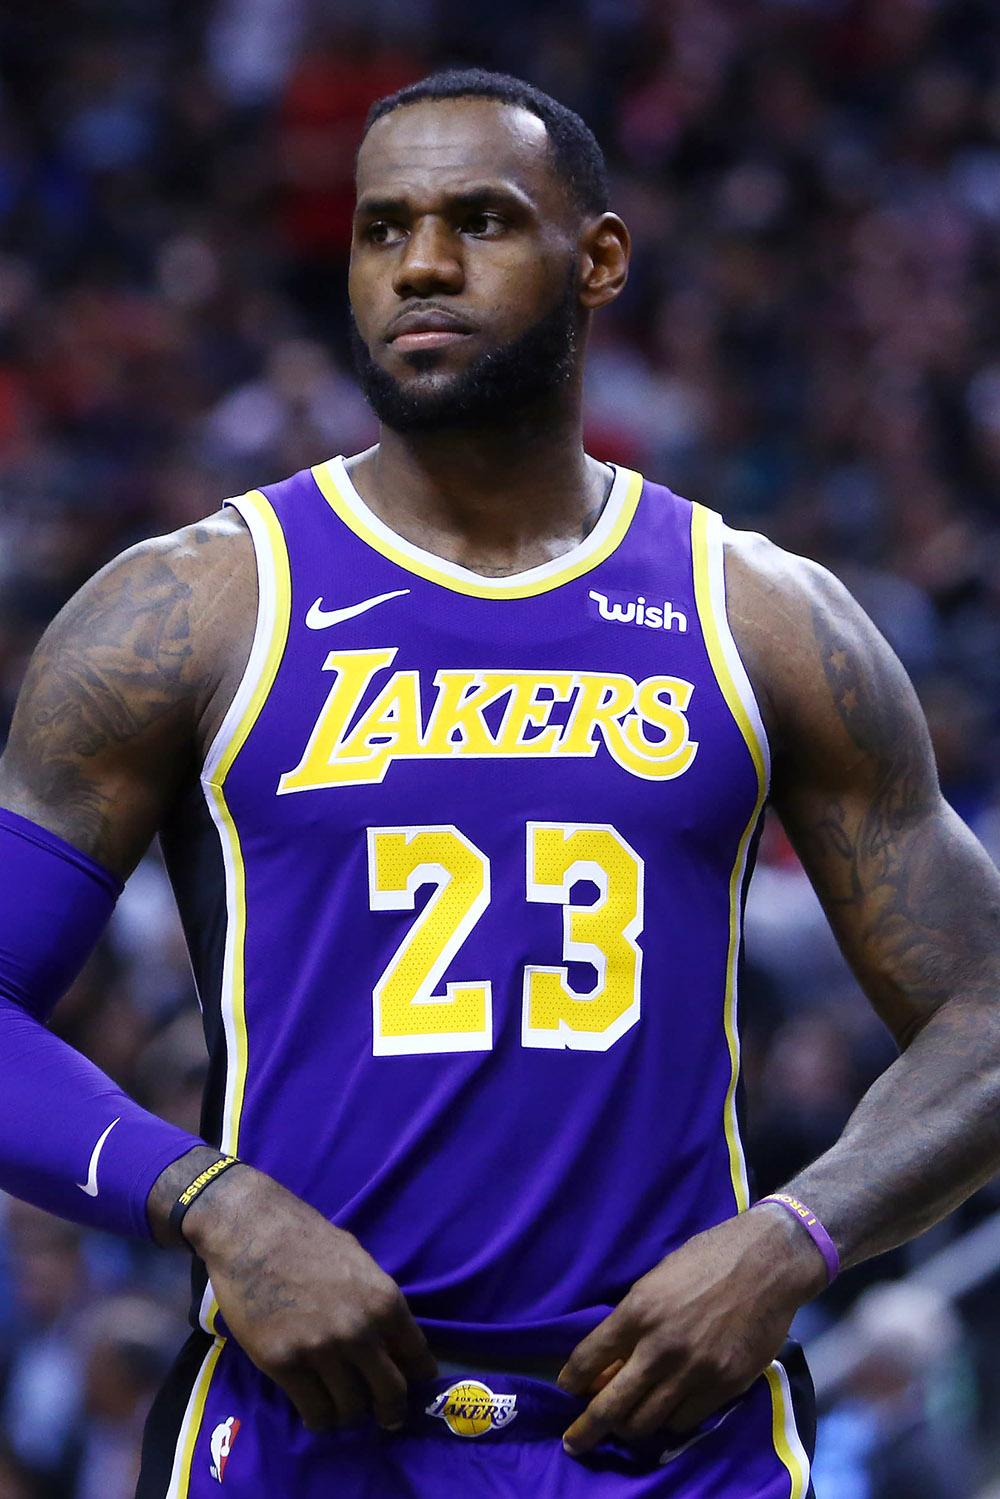 2019 Los Angeles Lakers season